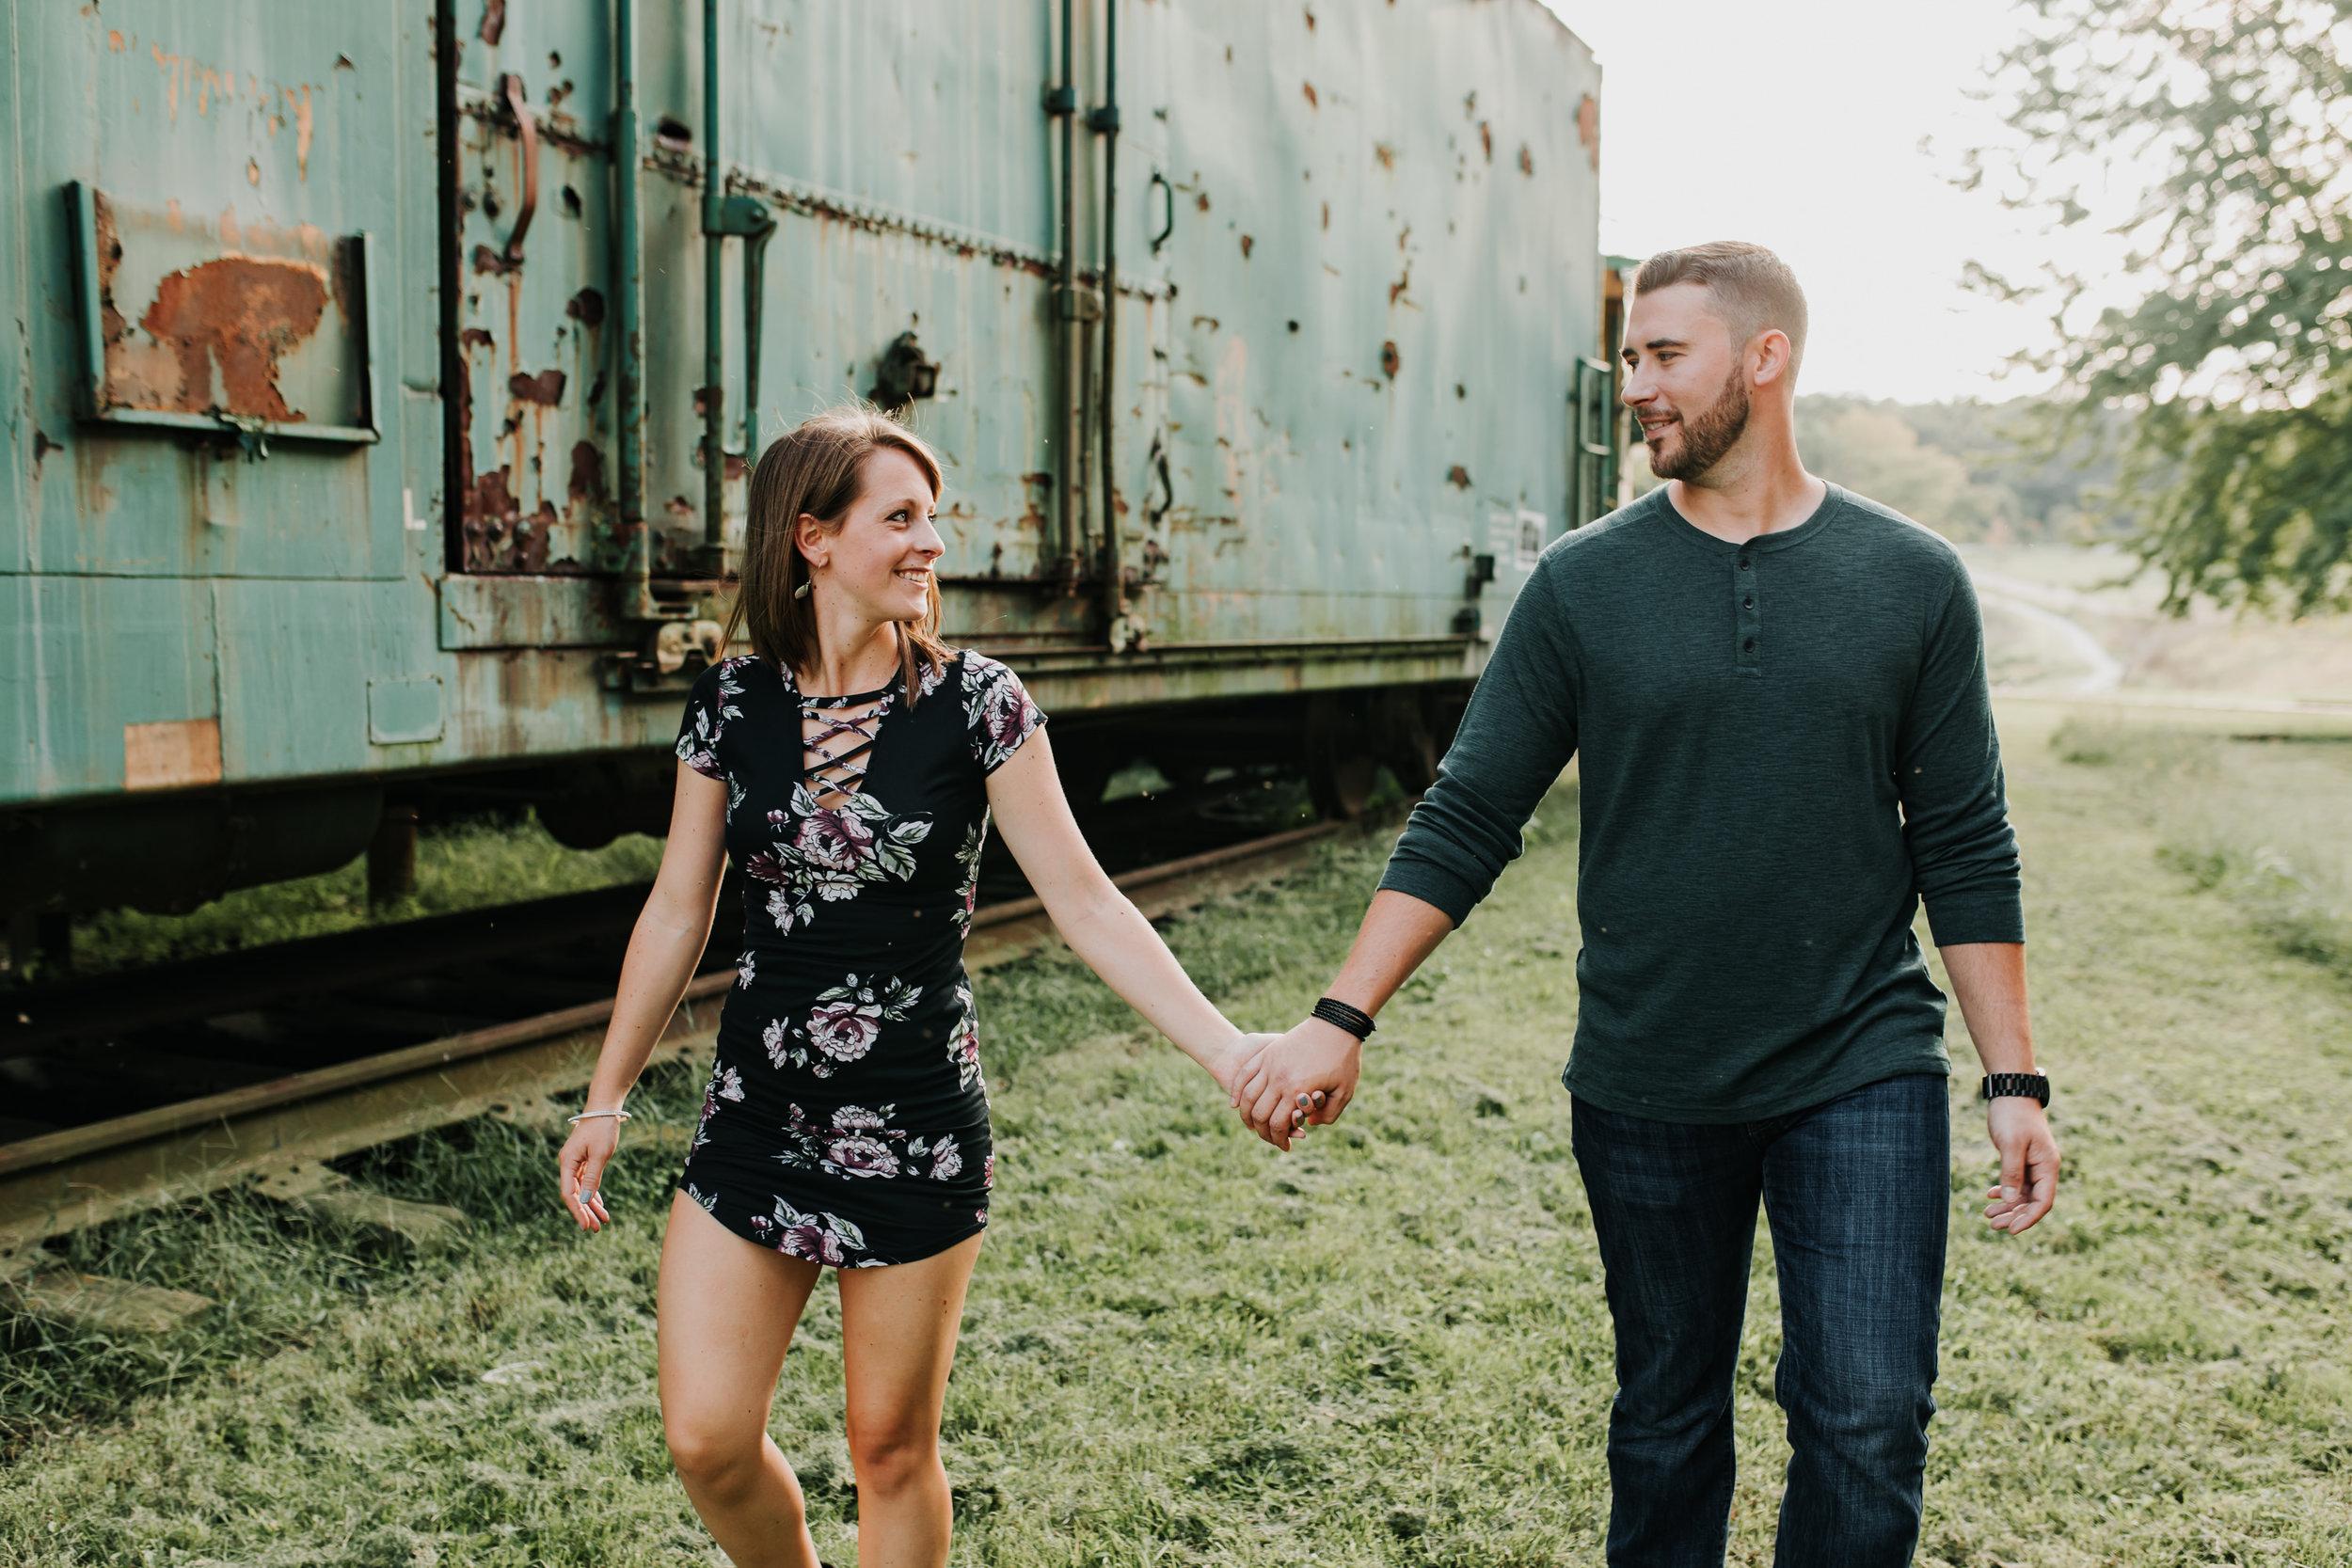 Leslie & Austin - Engaged - Nathaniel Jensen Photography - Omaha Nebraska Wedding Photograper - Engagement Session-24.jpg